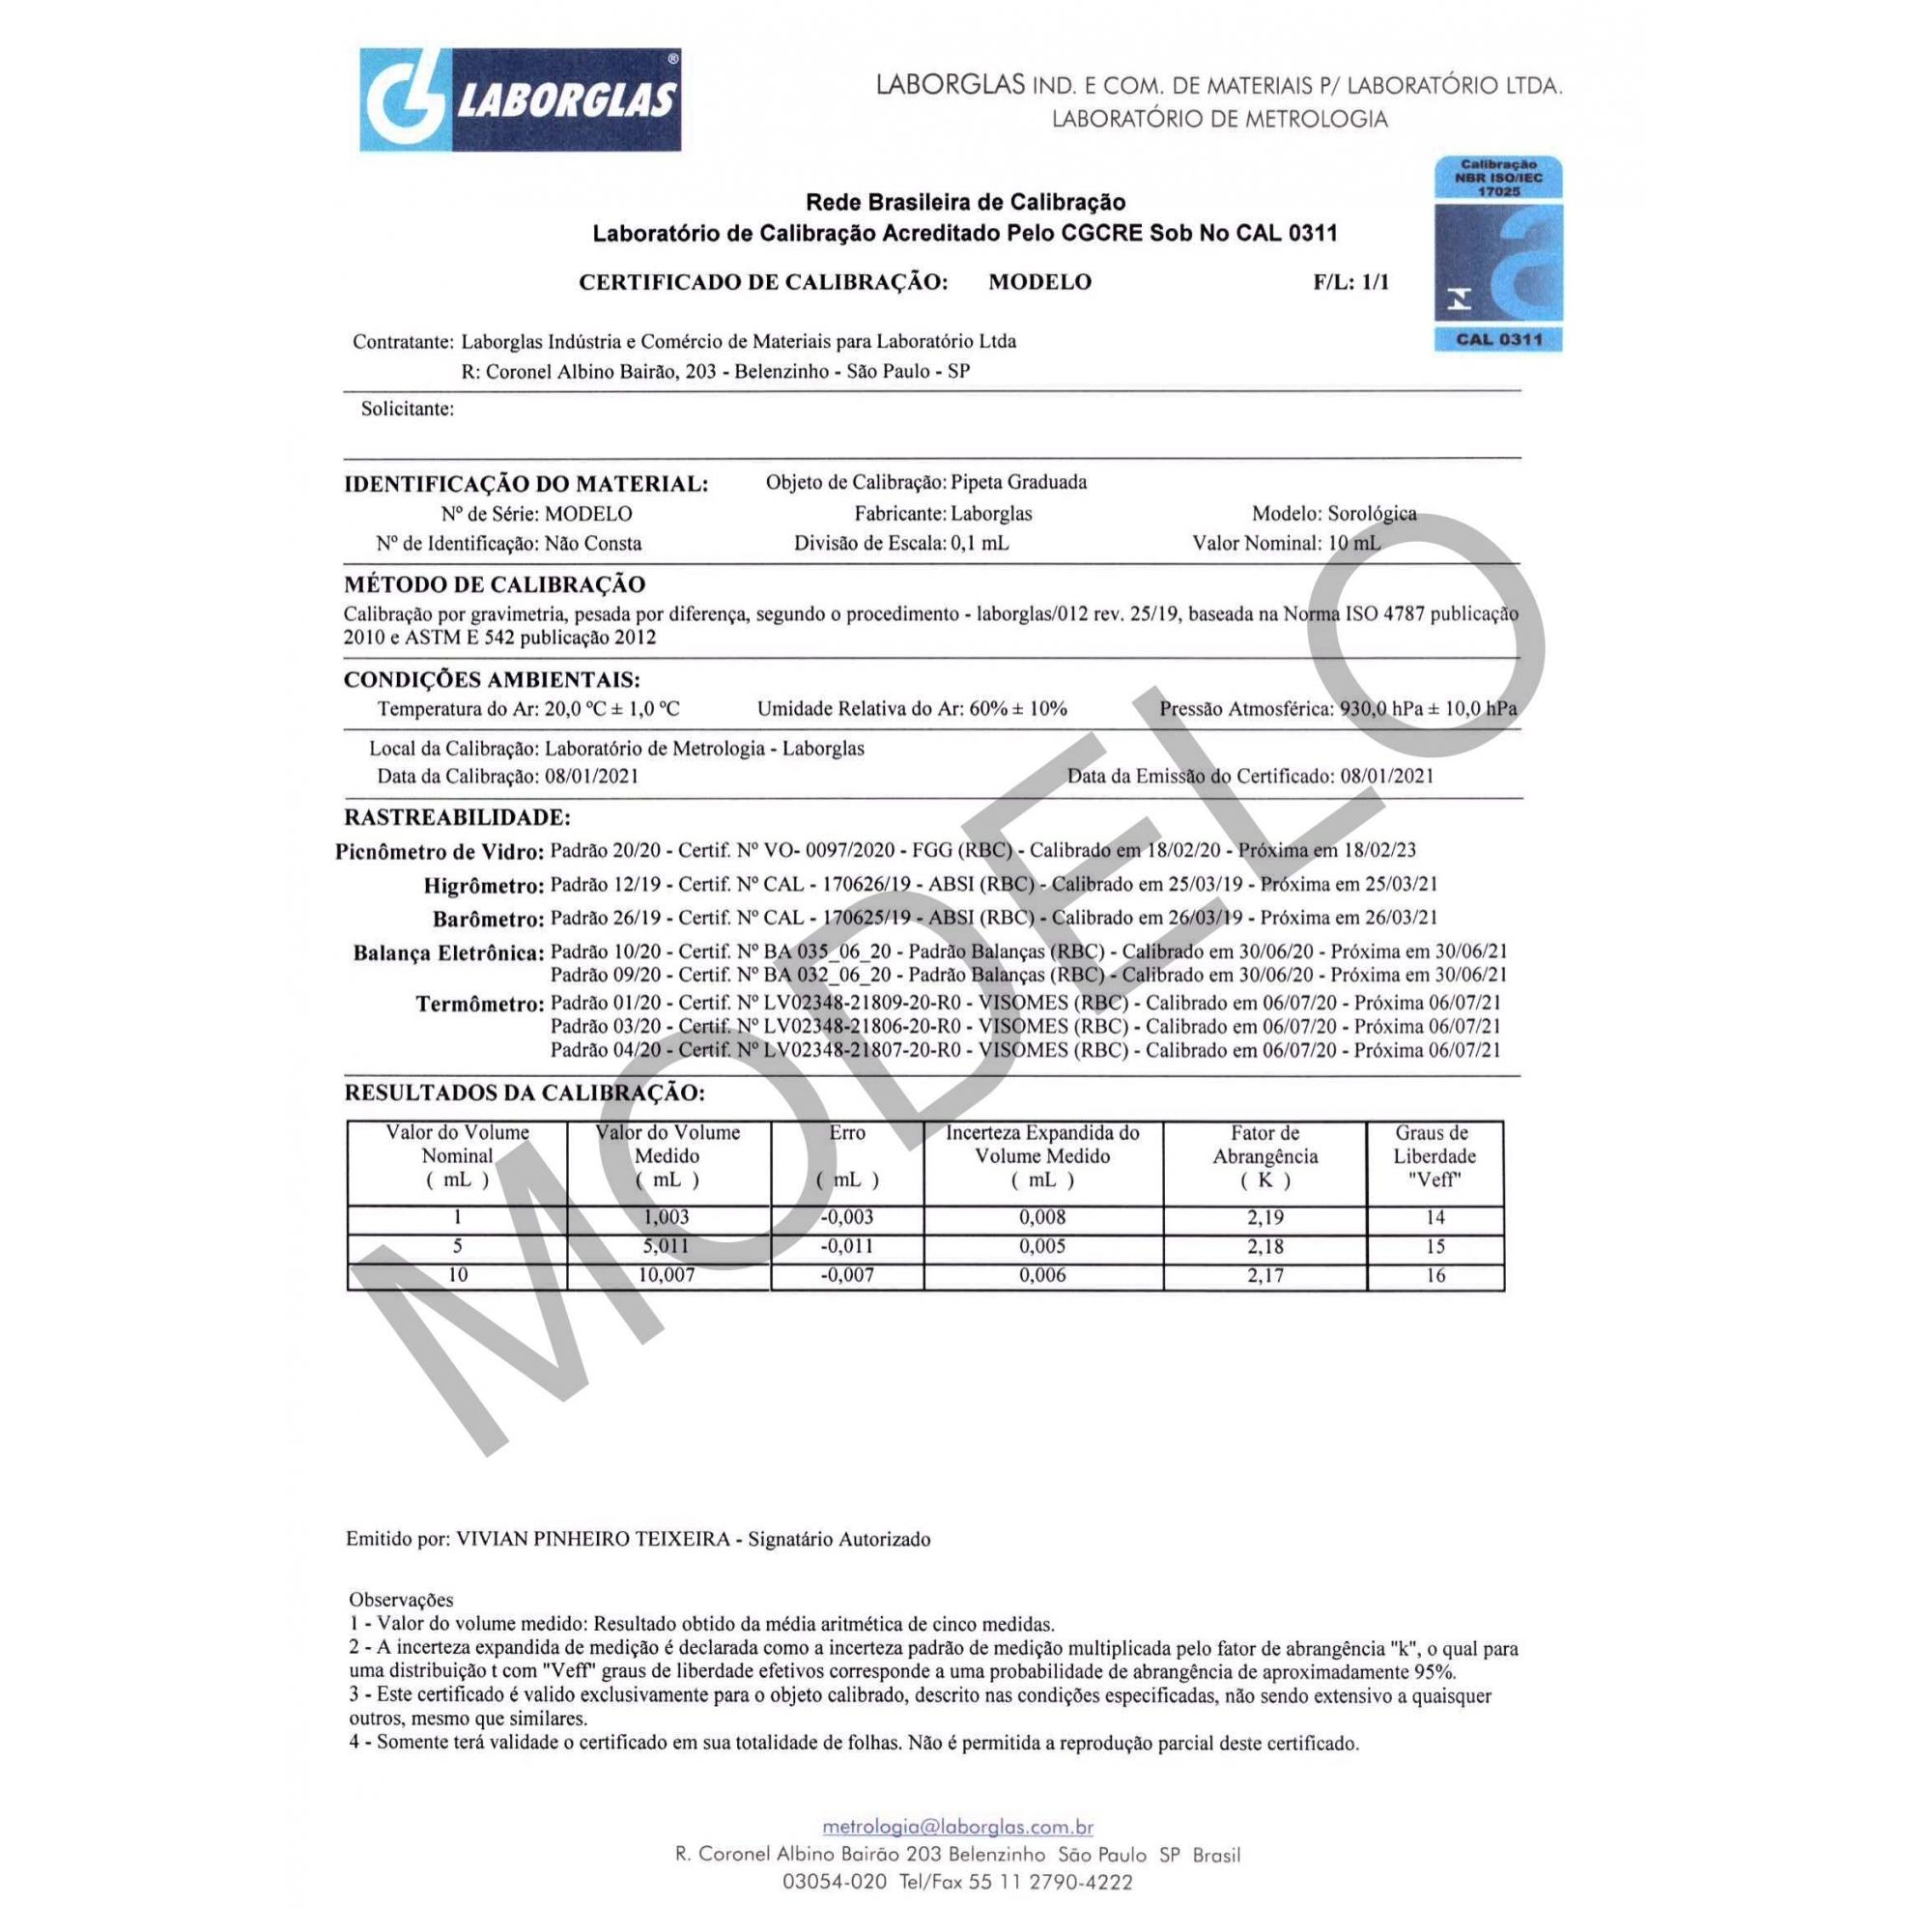 PIPETA GRAD. SOROL. ESGOT. TOTAL 50 ML 2/10 COM CERTIFICADO RBC - Laborglas - Cód. 9434314-R